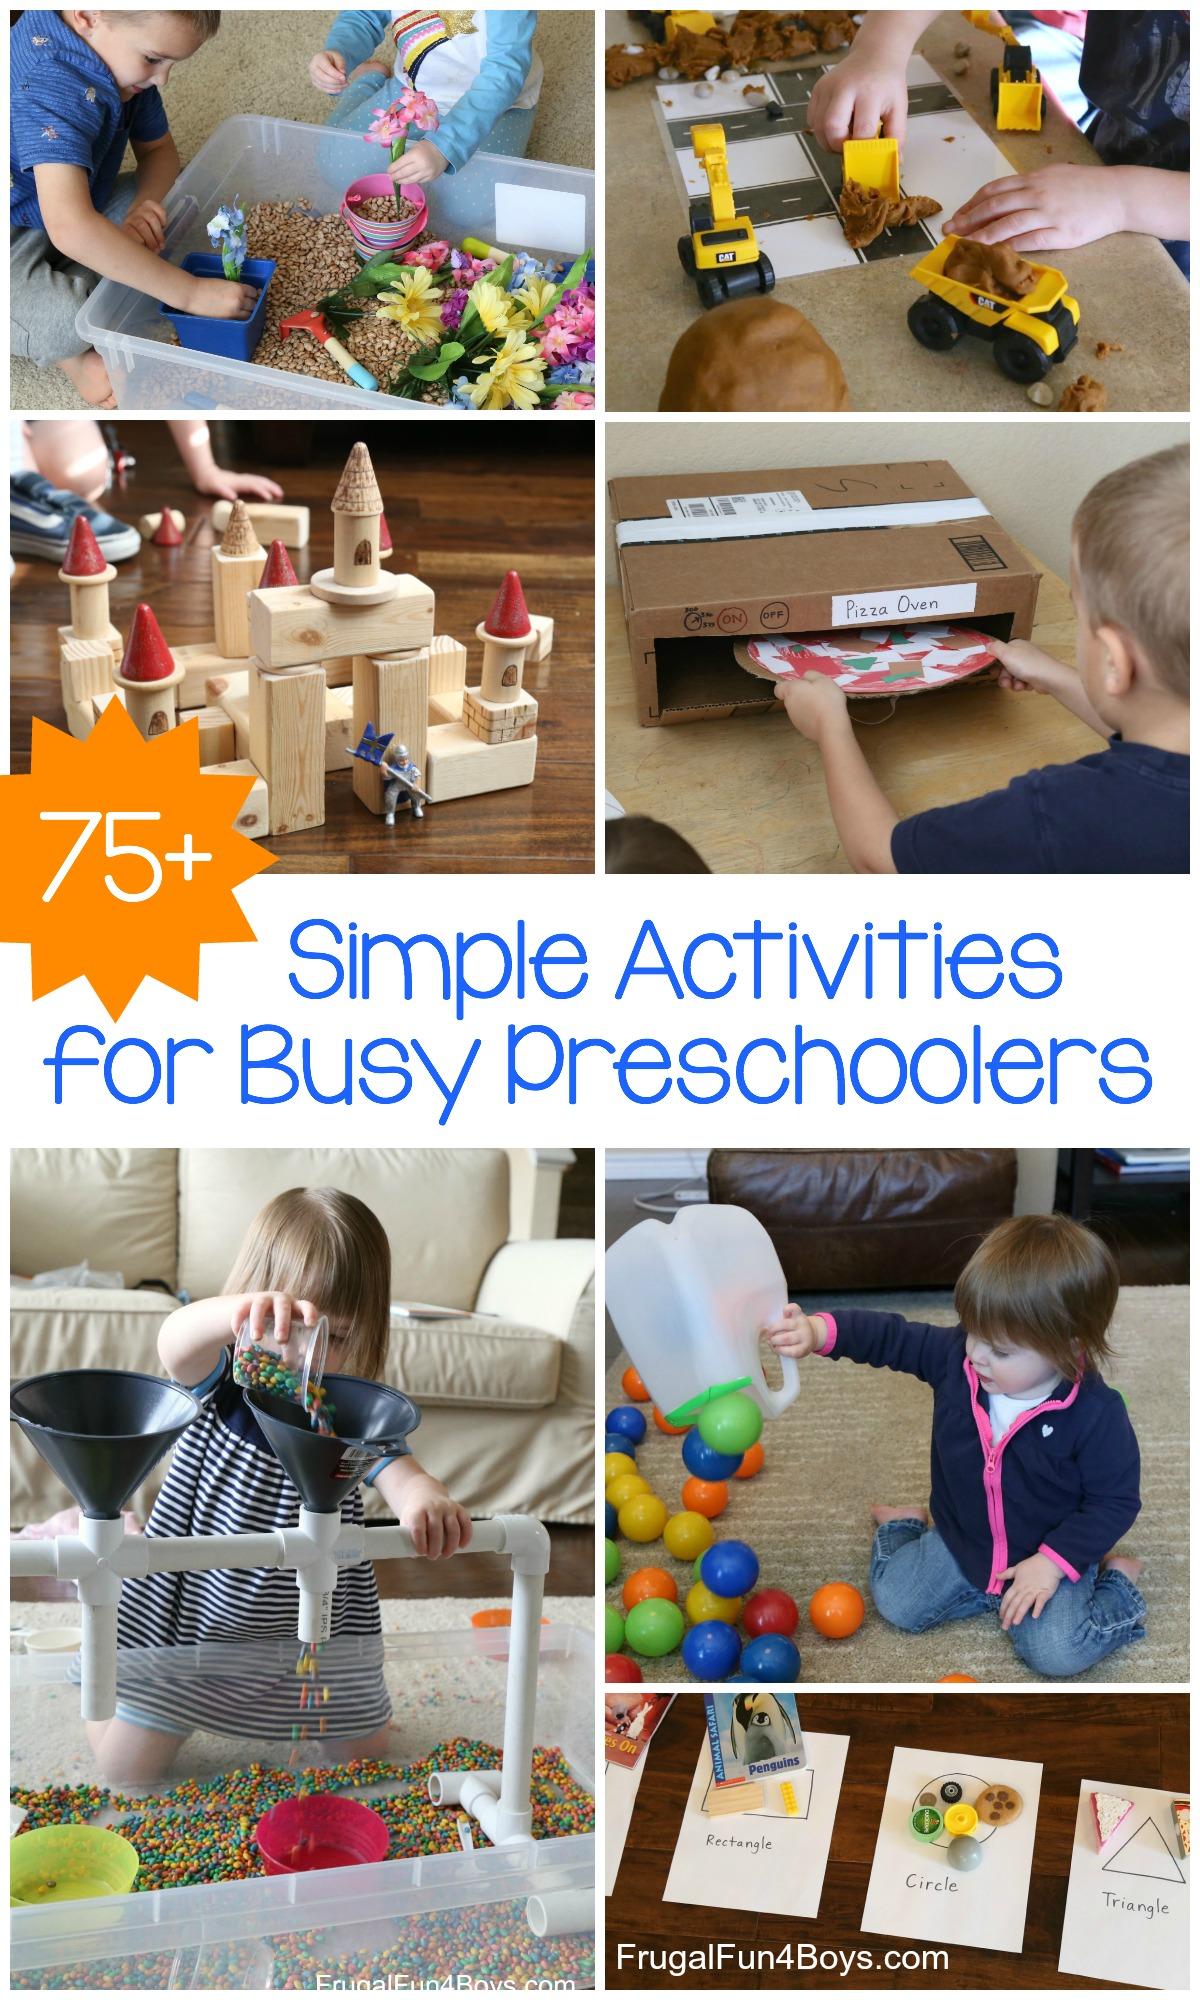 75 Of The Best Simple Activities For Busy Preschoolers